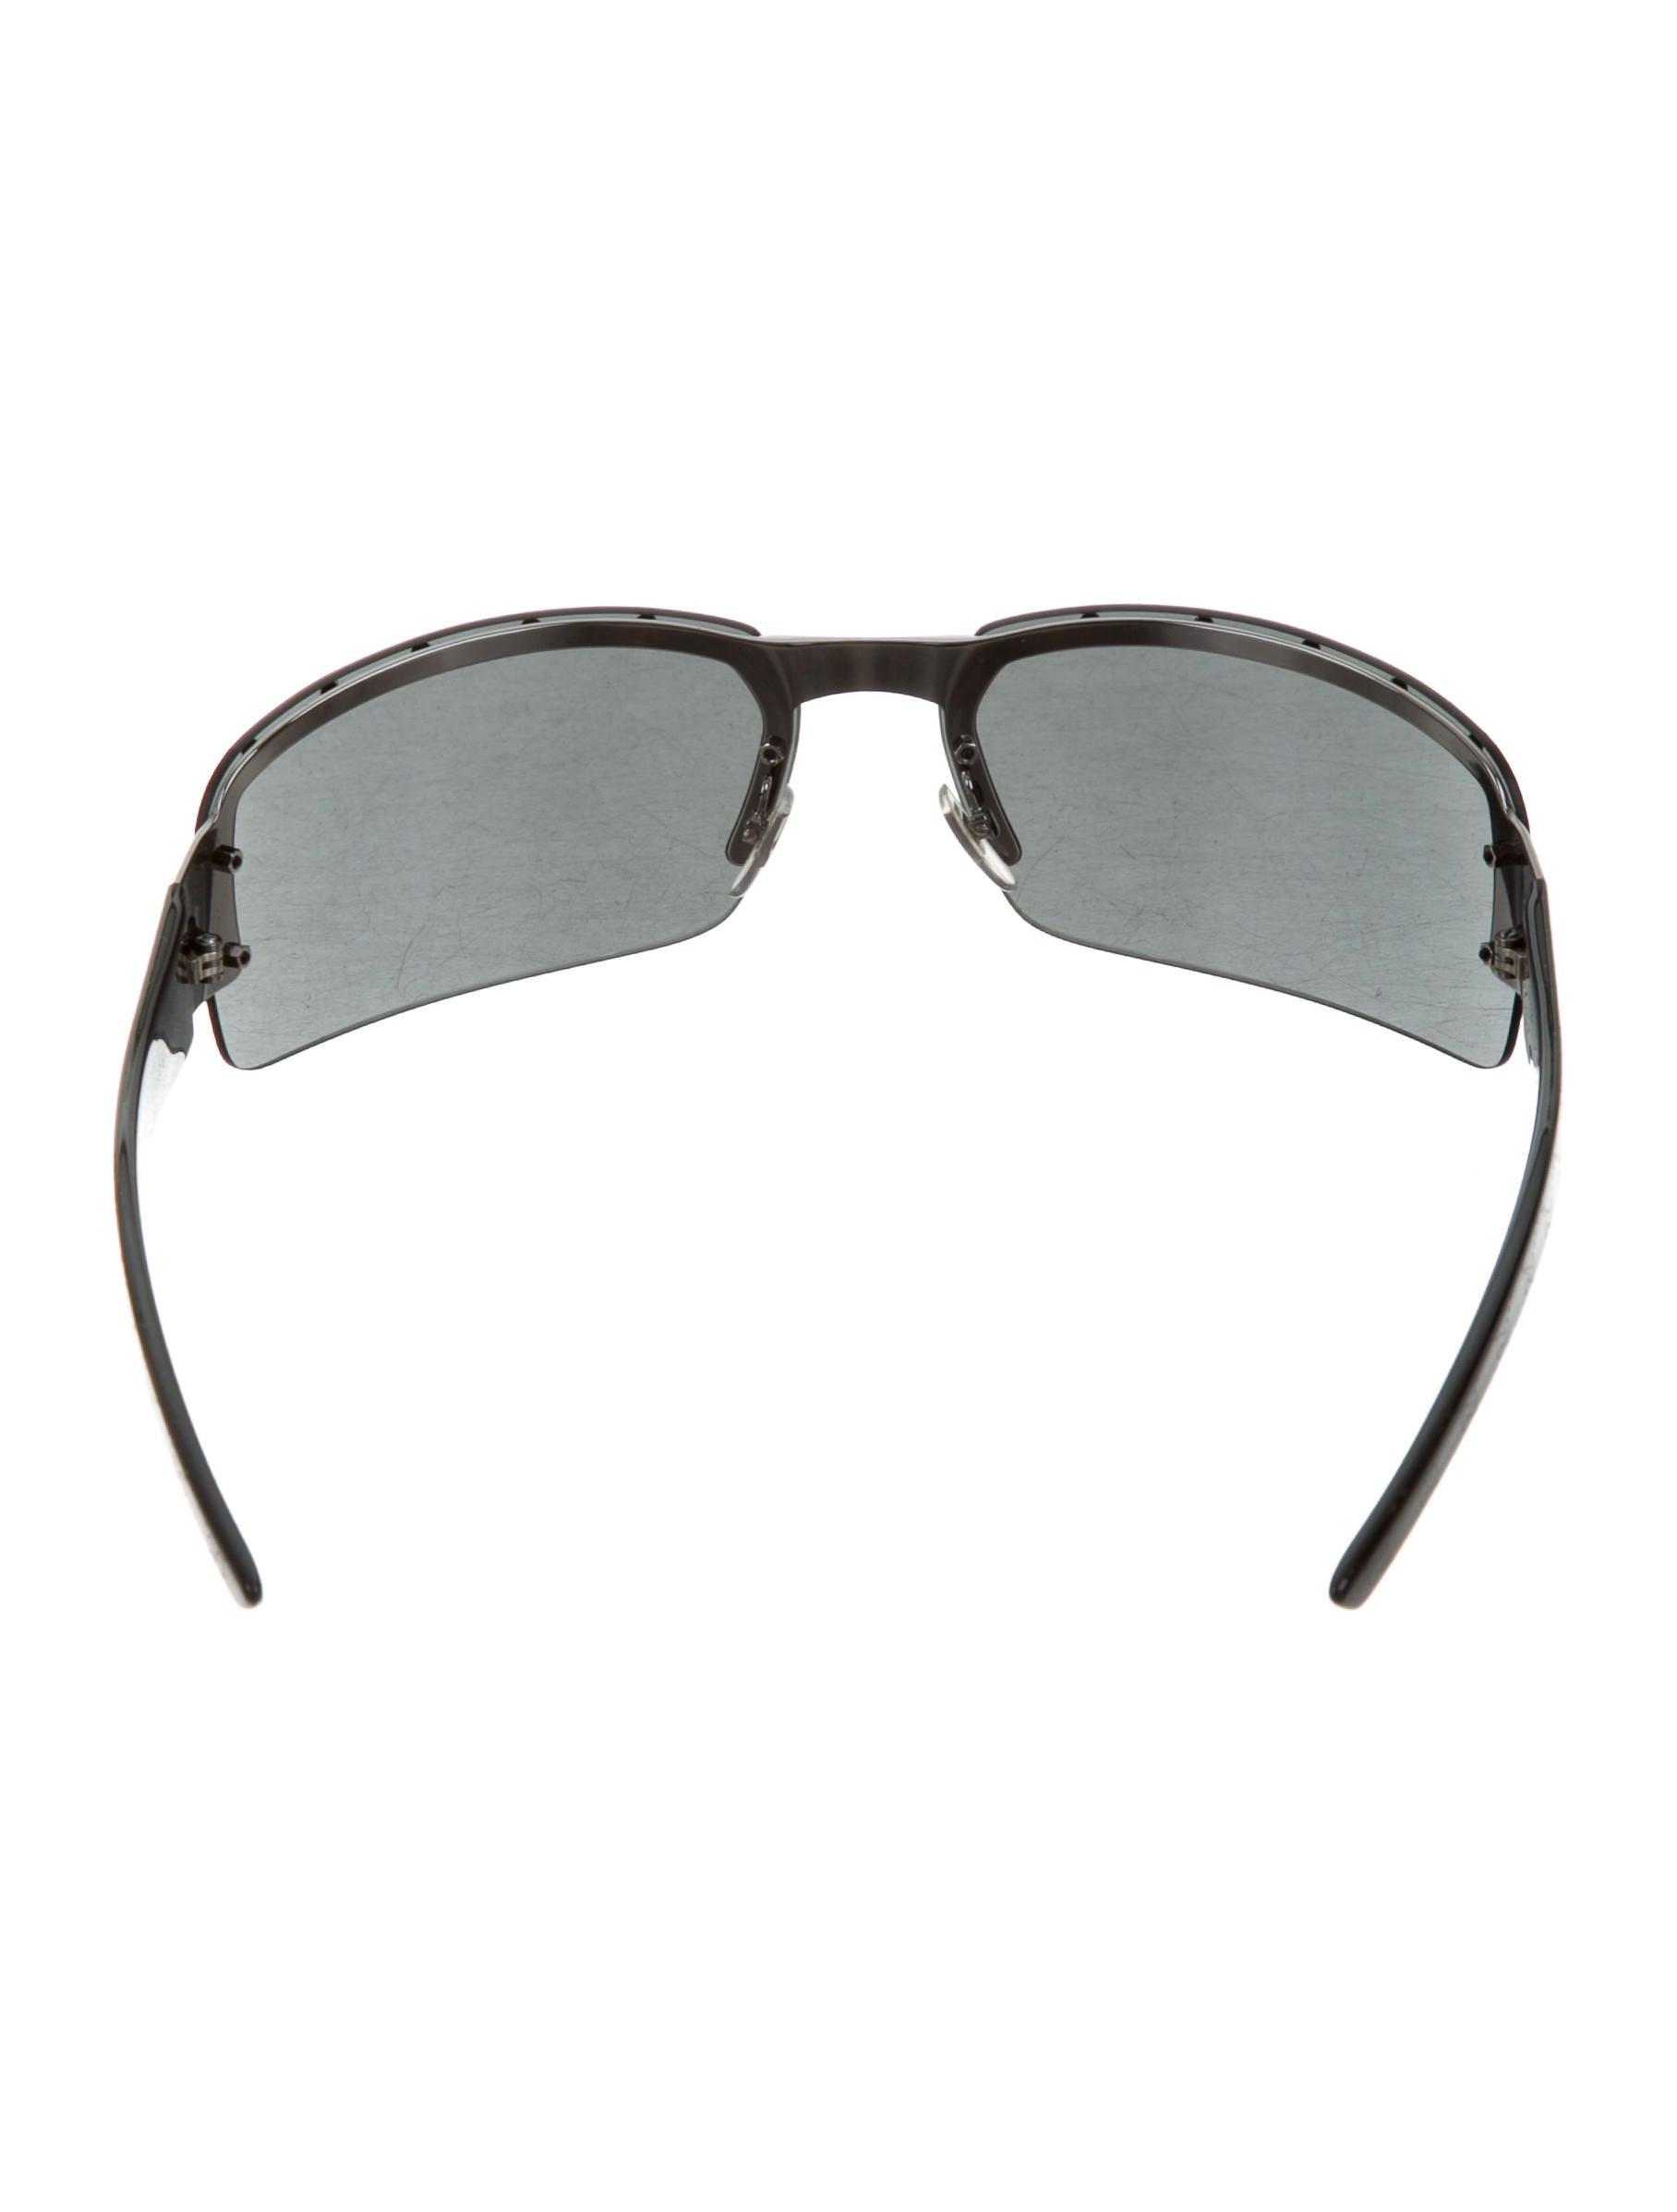 84d296782cf Gucci Rimless Shield Sunglasses Mens « One More Soul